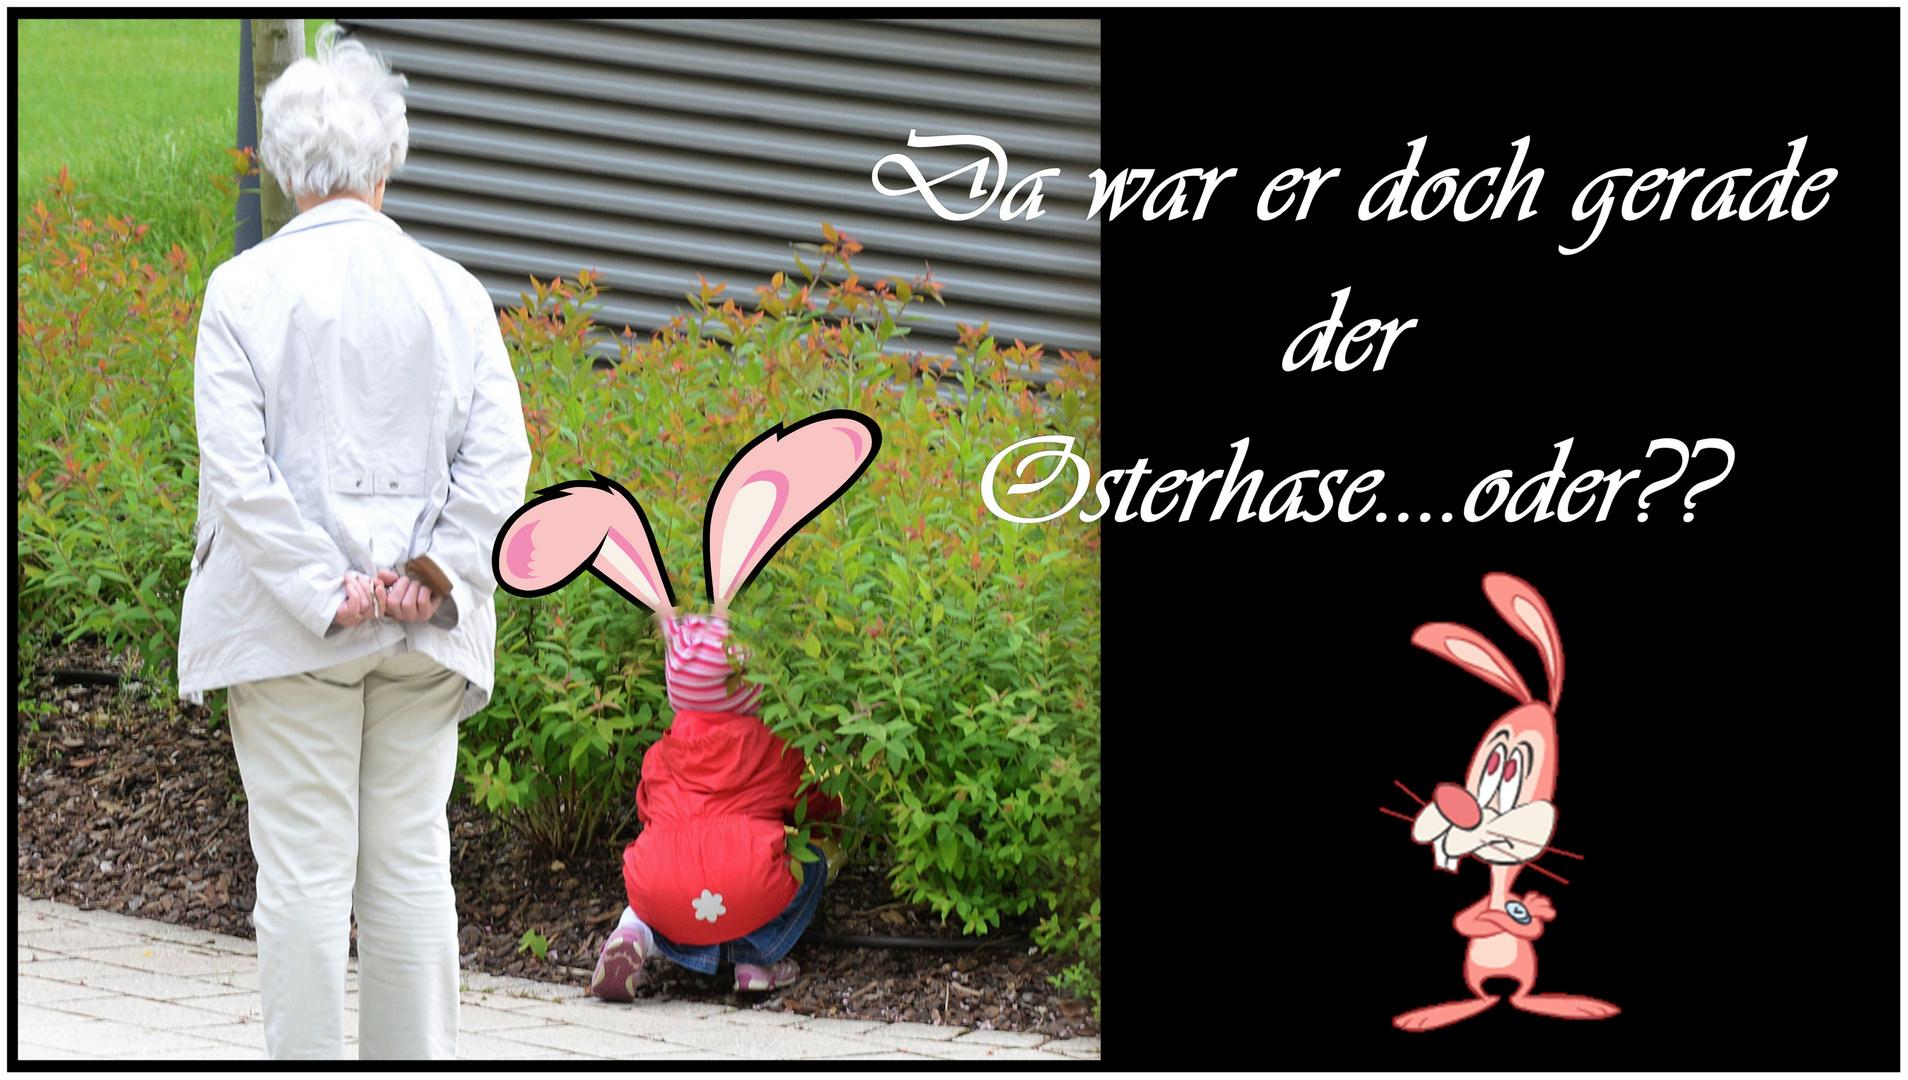 So war Ostern..... ;-))